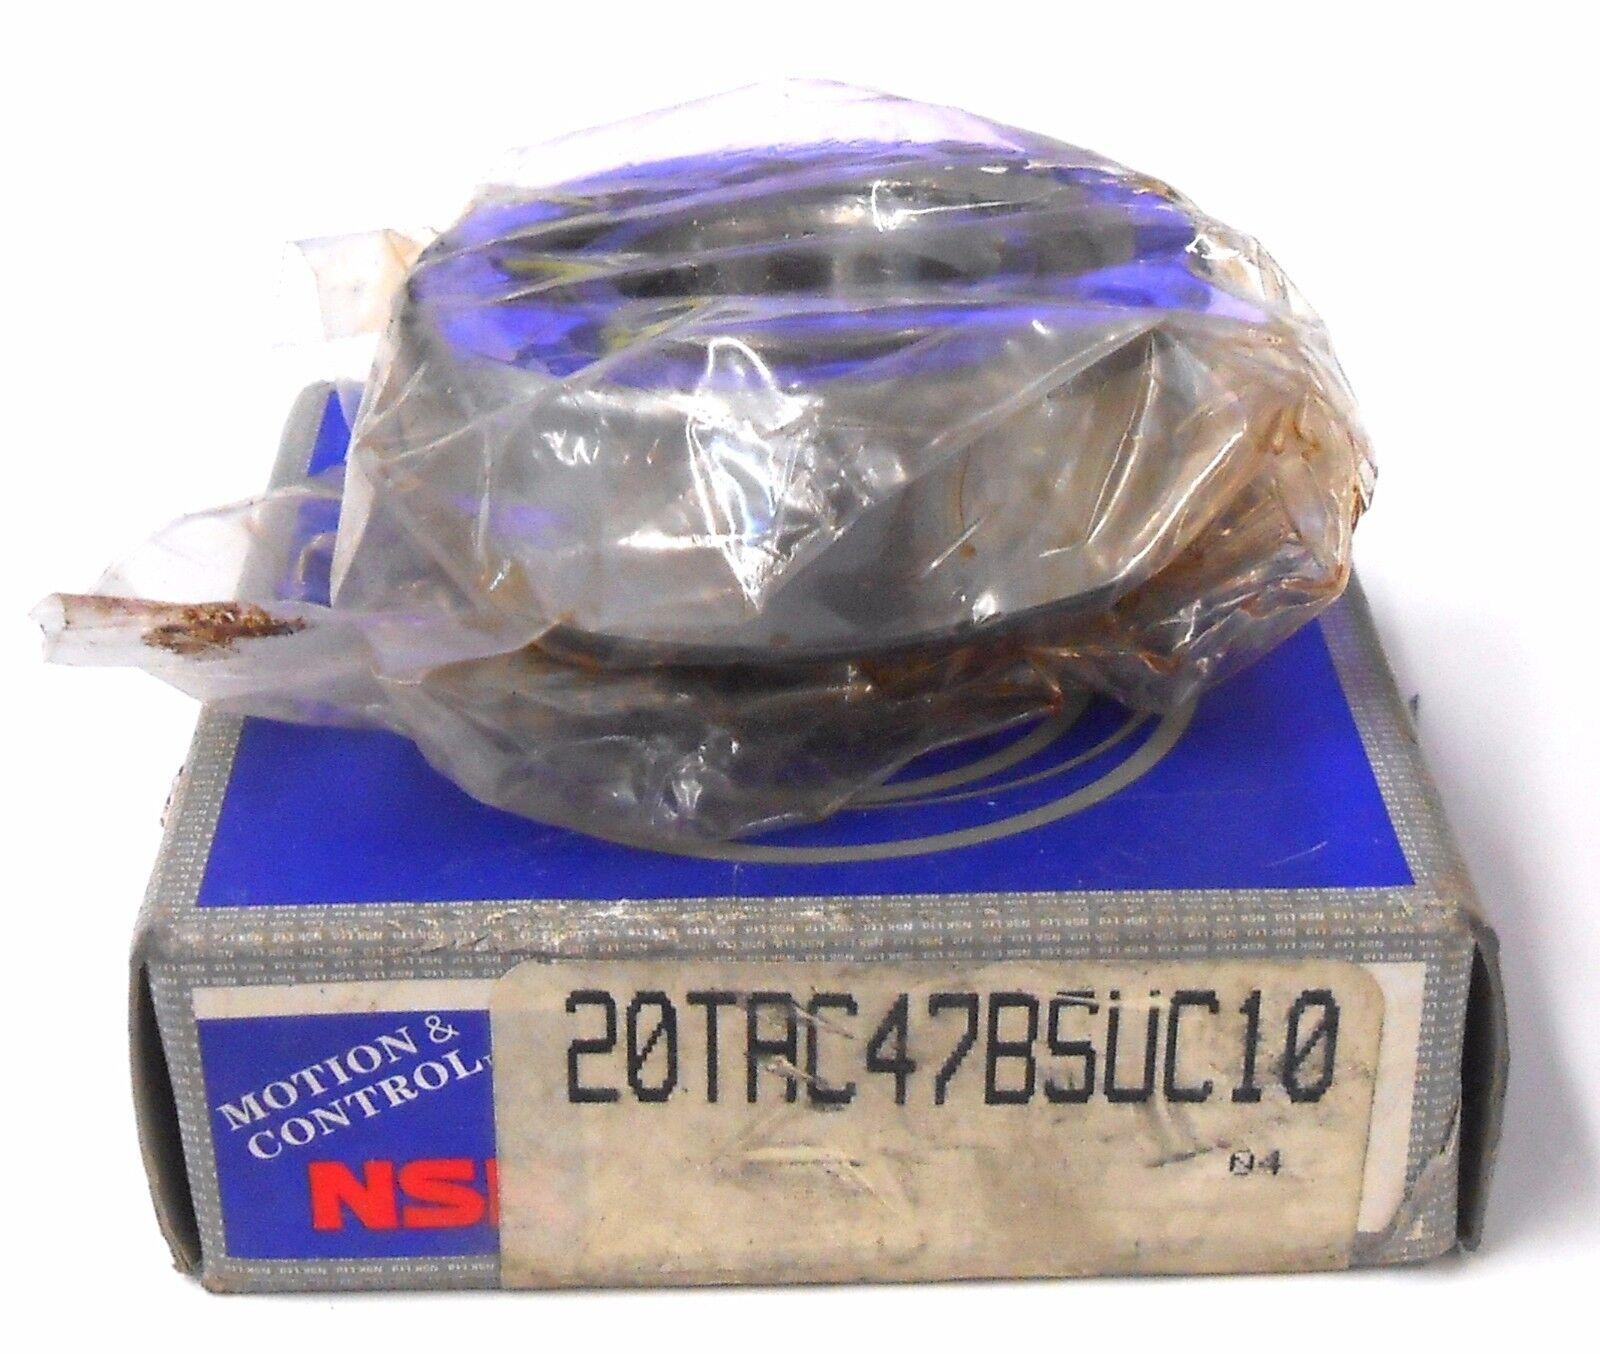 NSK BEARING 20TAC476SUC10, 20 MM BORE, 47 MM OD, 15 MM WIDTH